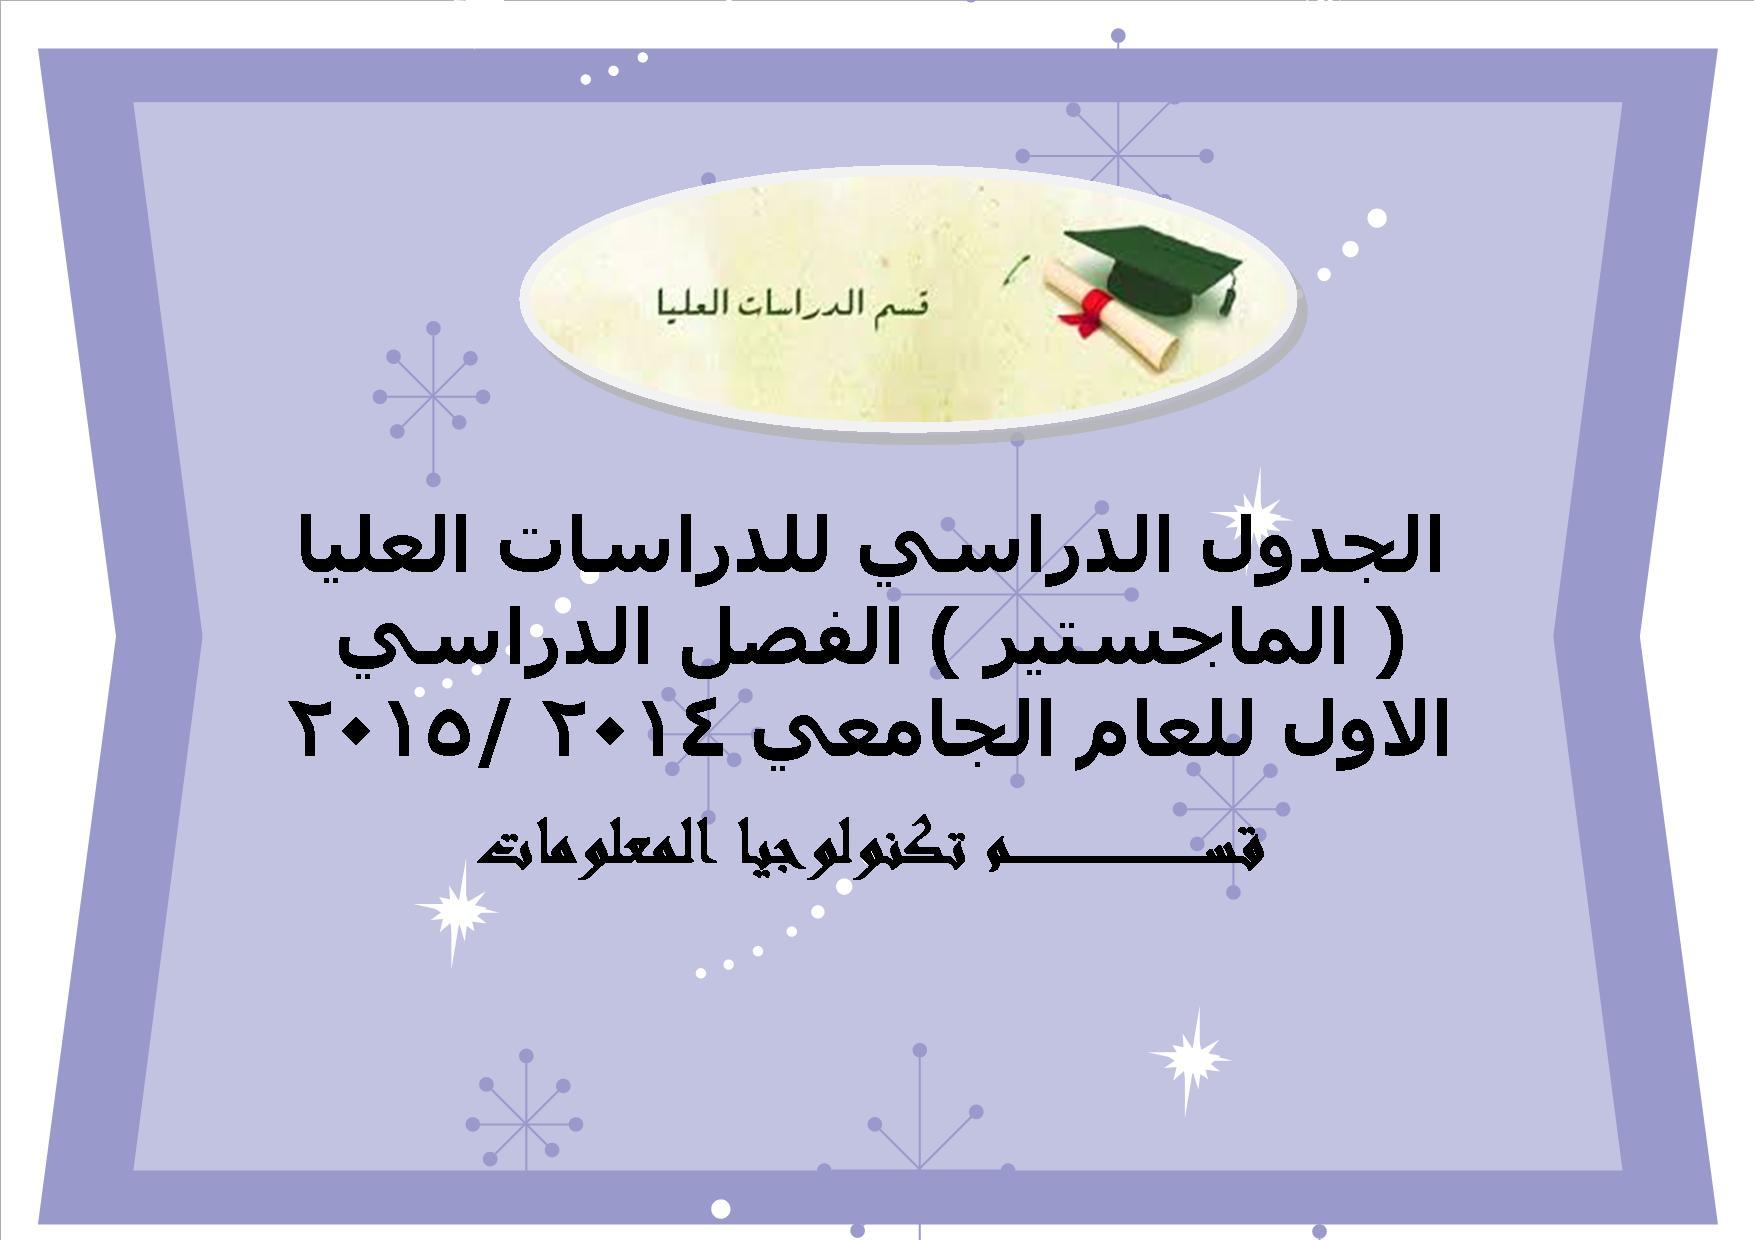 Course schedule for postgraduate studies (Master